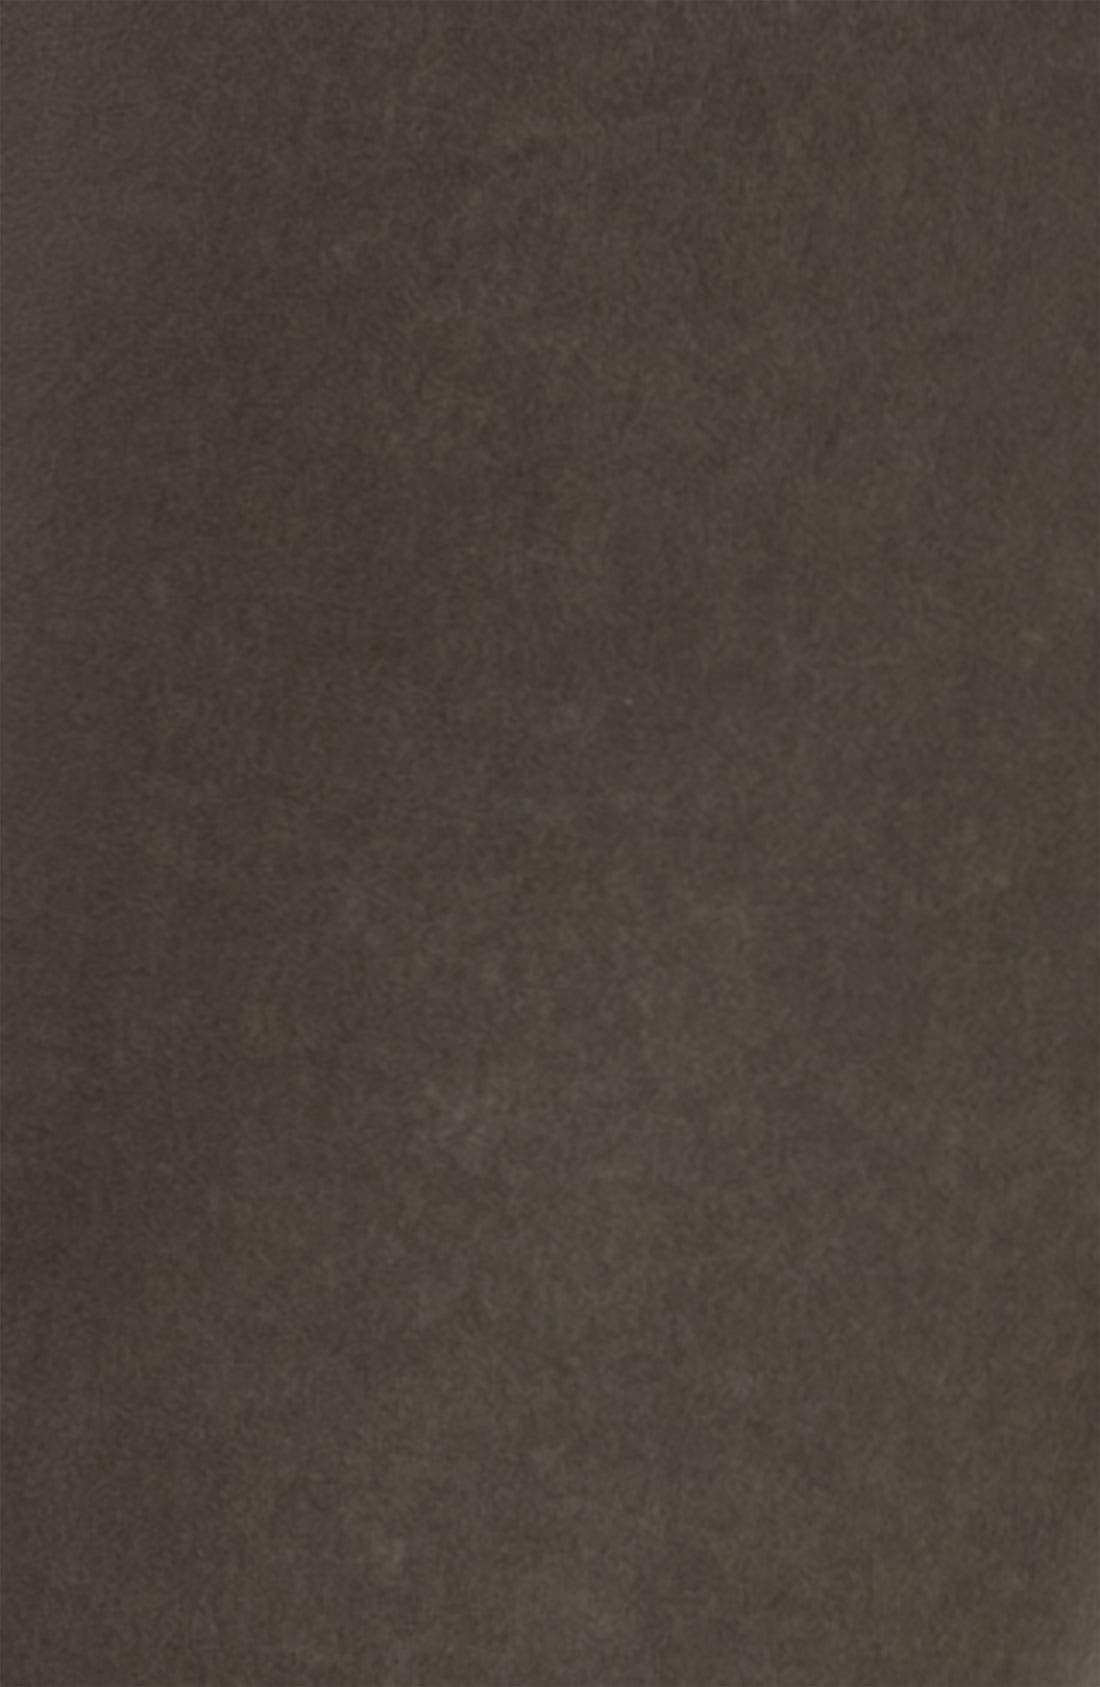 '8001' Lambskin Leather Pants,                             Alternate thumbnail 52, color,